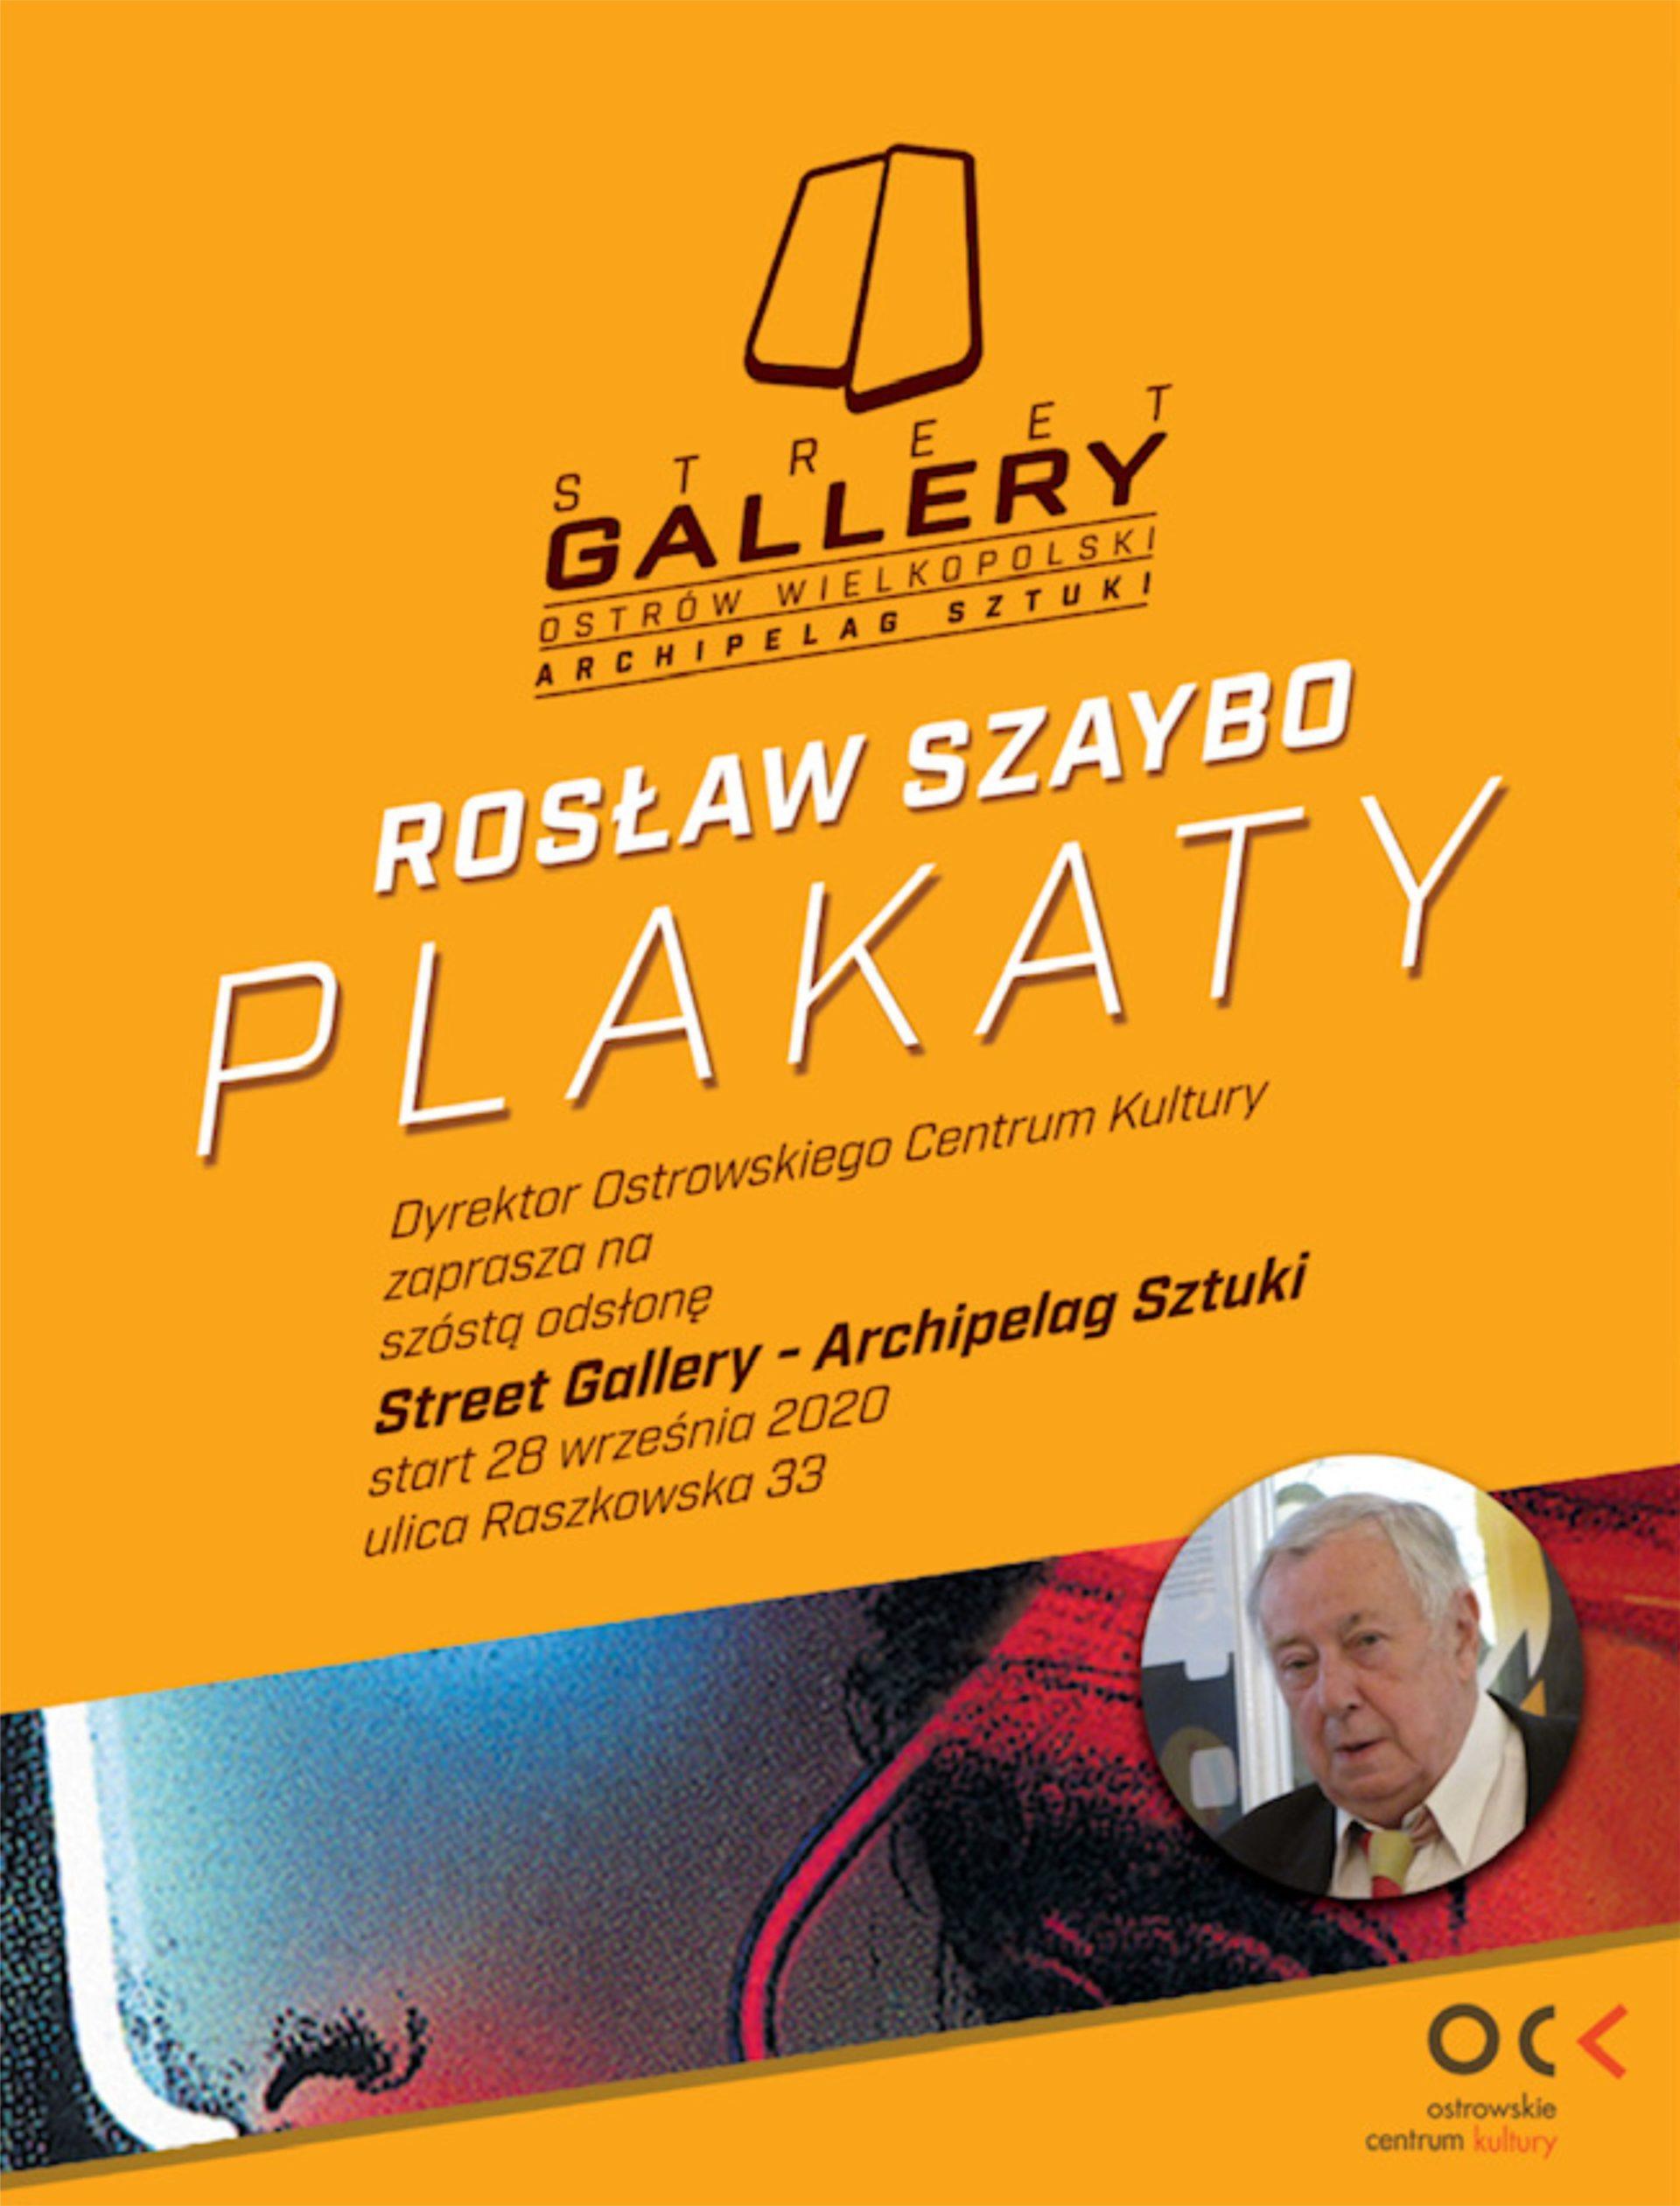 Rosław Szaybo | Plakaty | Street Gallery Archipelag Sztuki